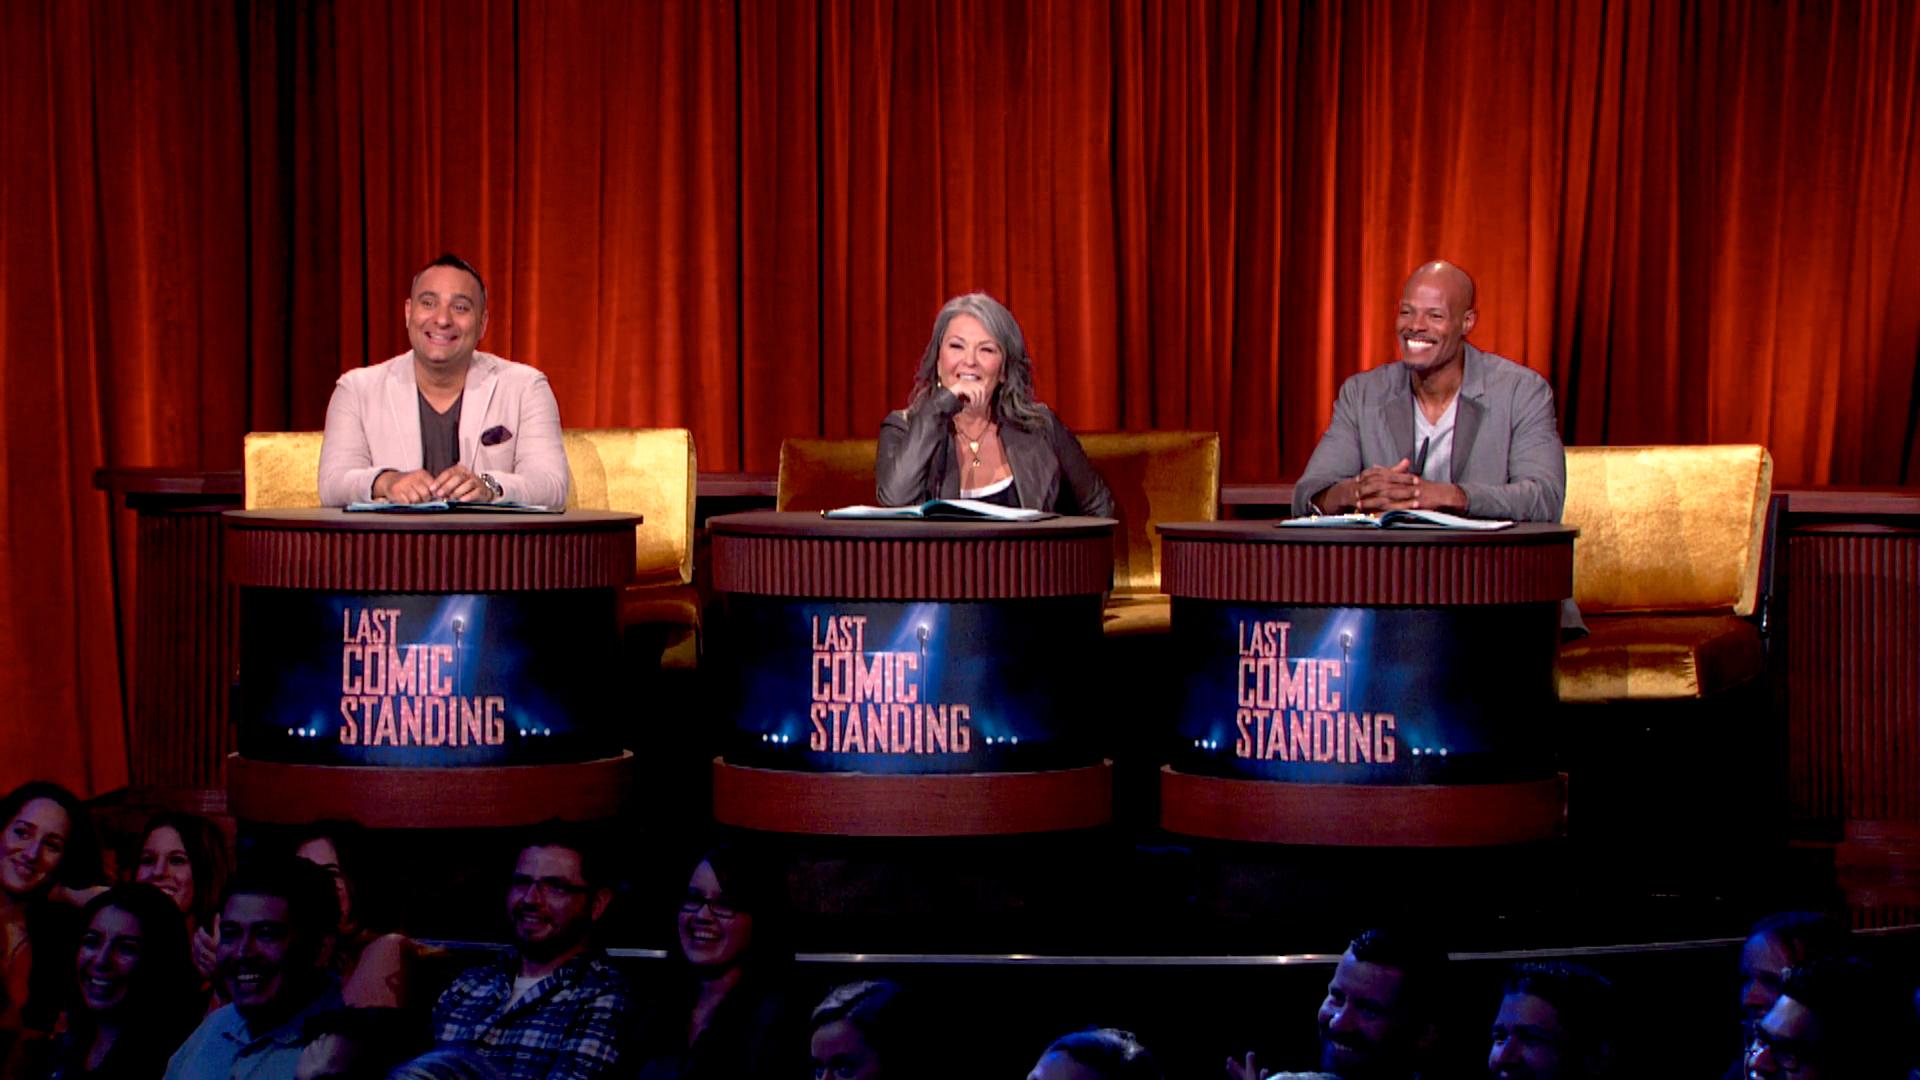 (L-R) Russell Peters, Roseanne Barr, Keenan Ivory Wayans